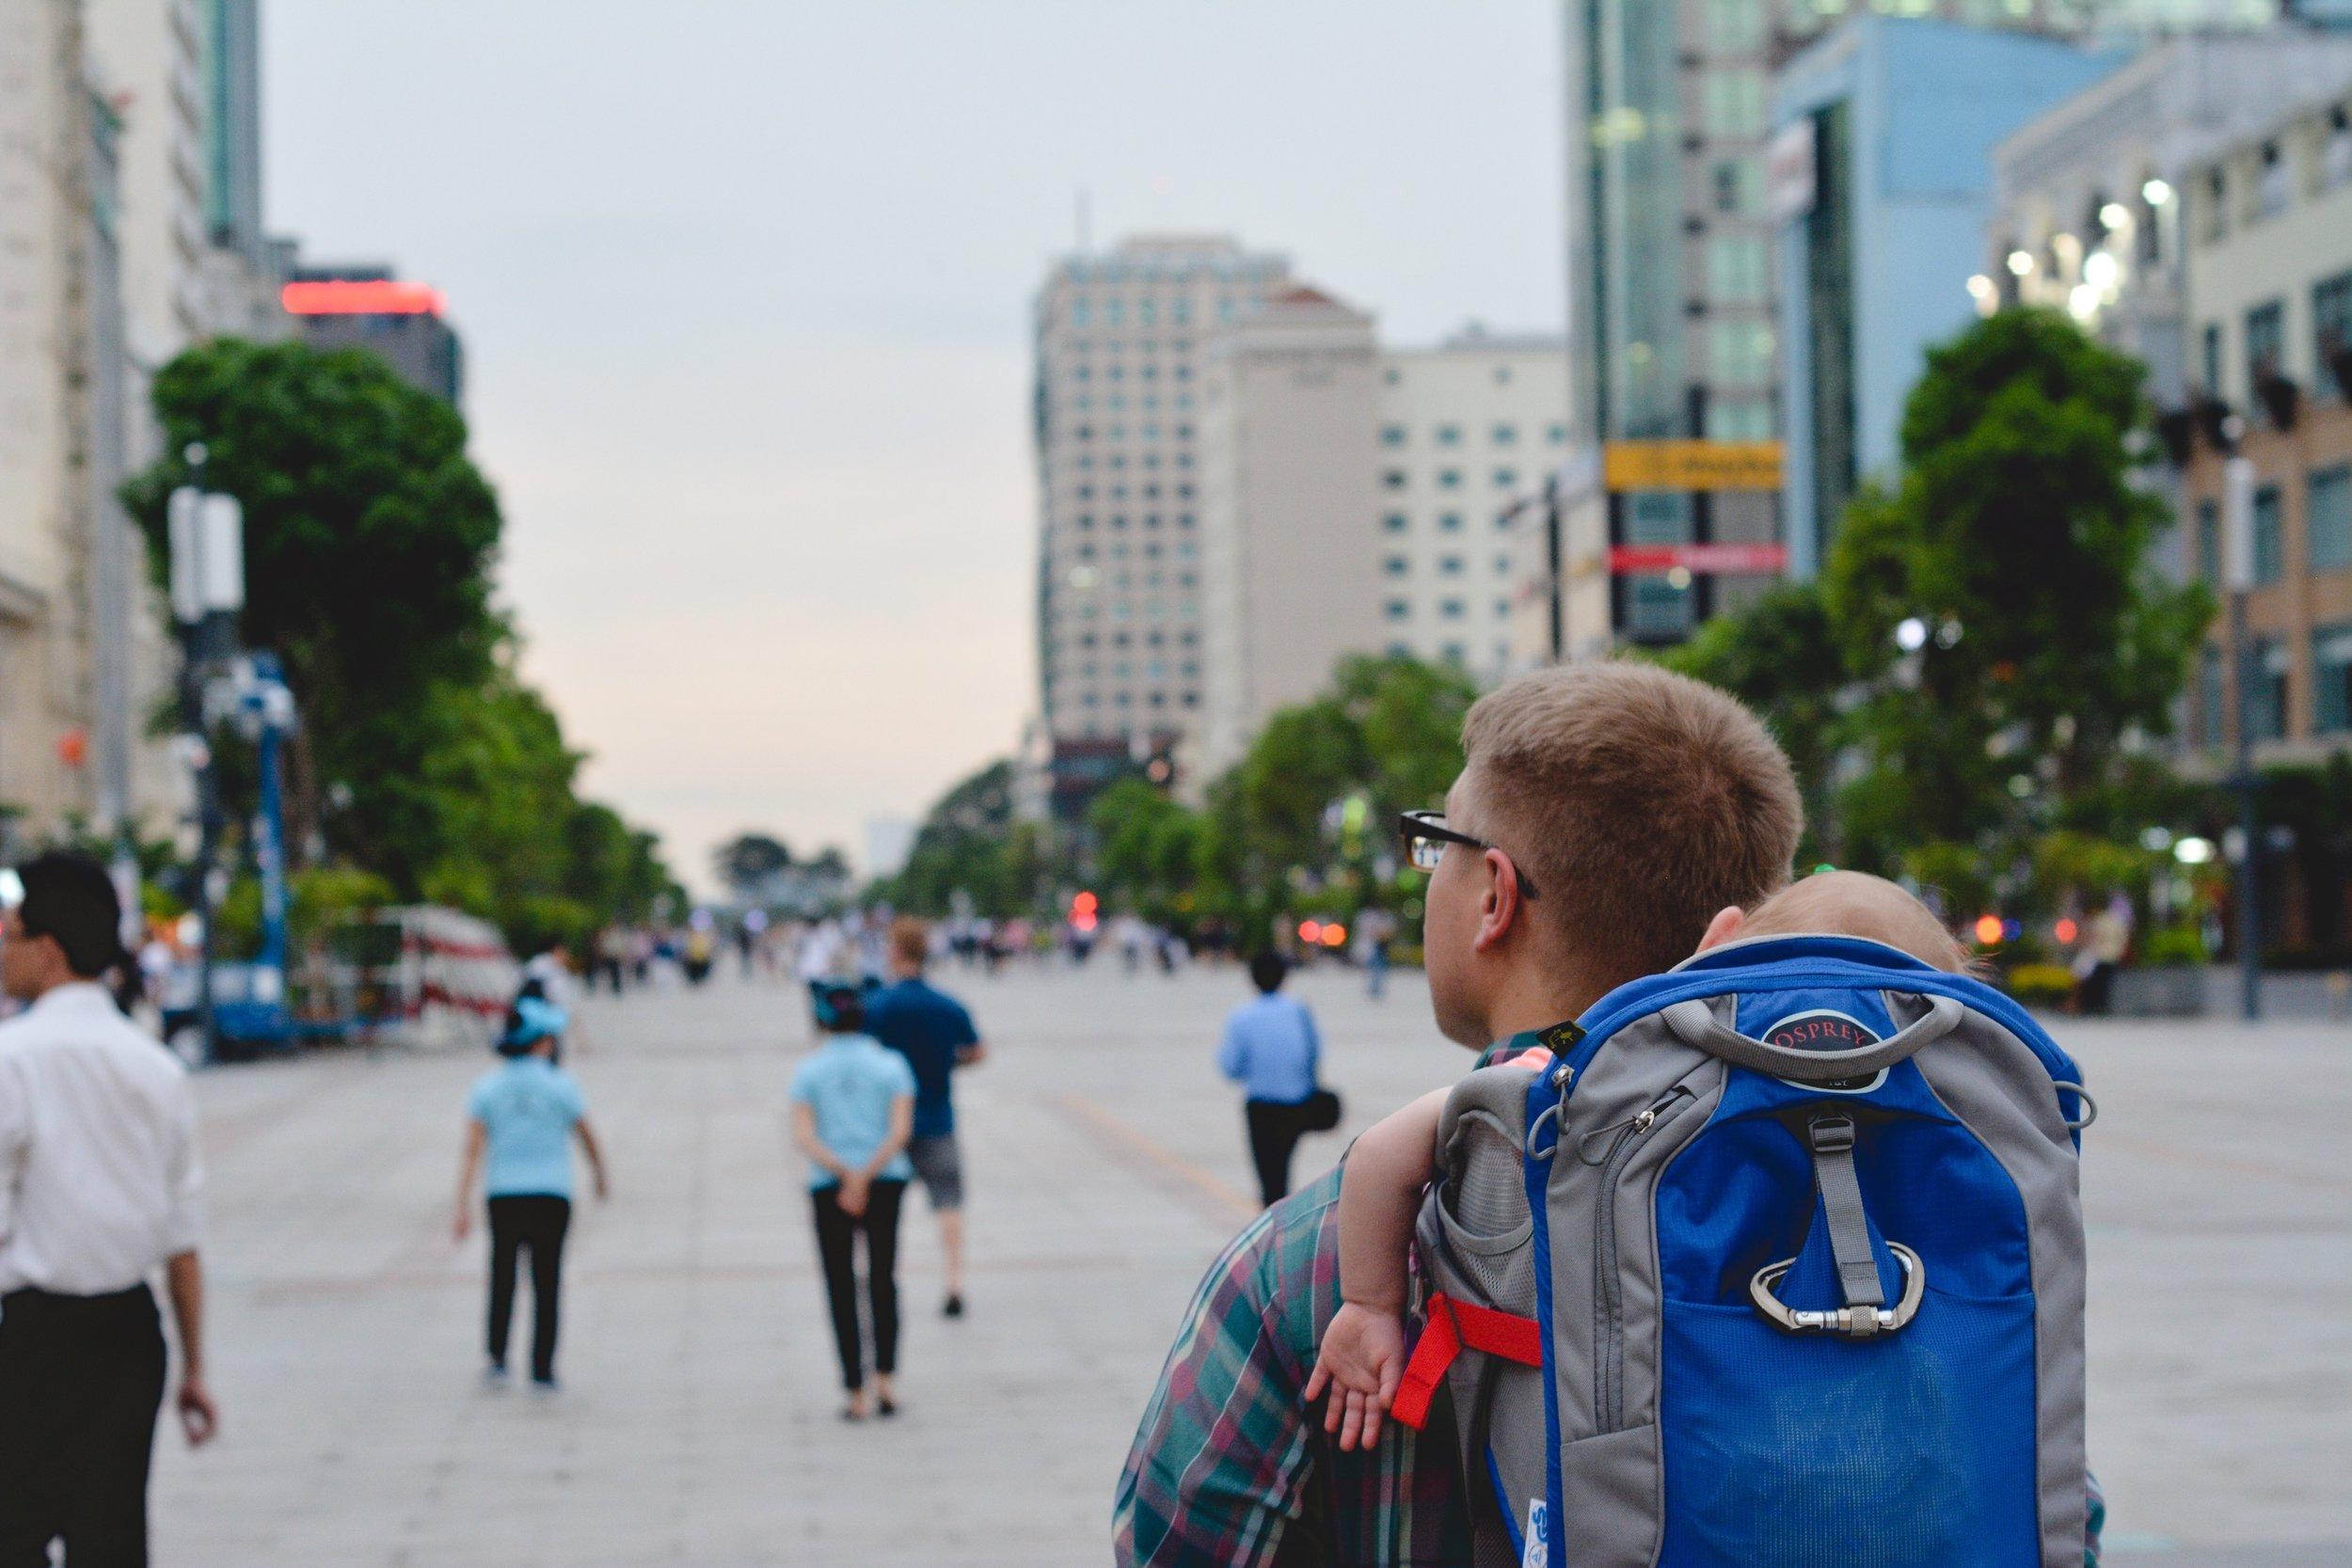 Ho Chi Minh City Vietnam Chasing The Cardozas